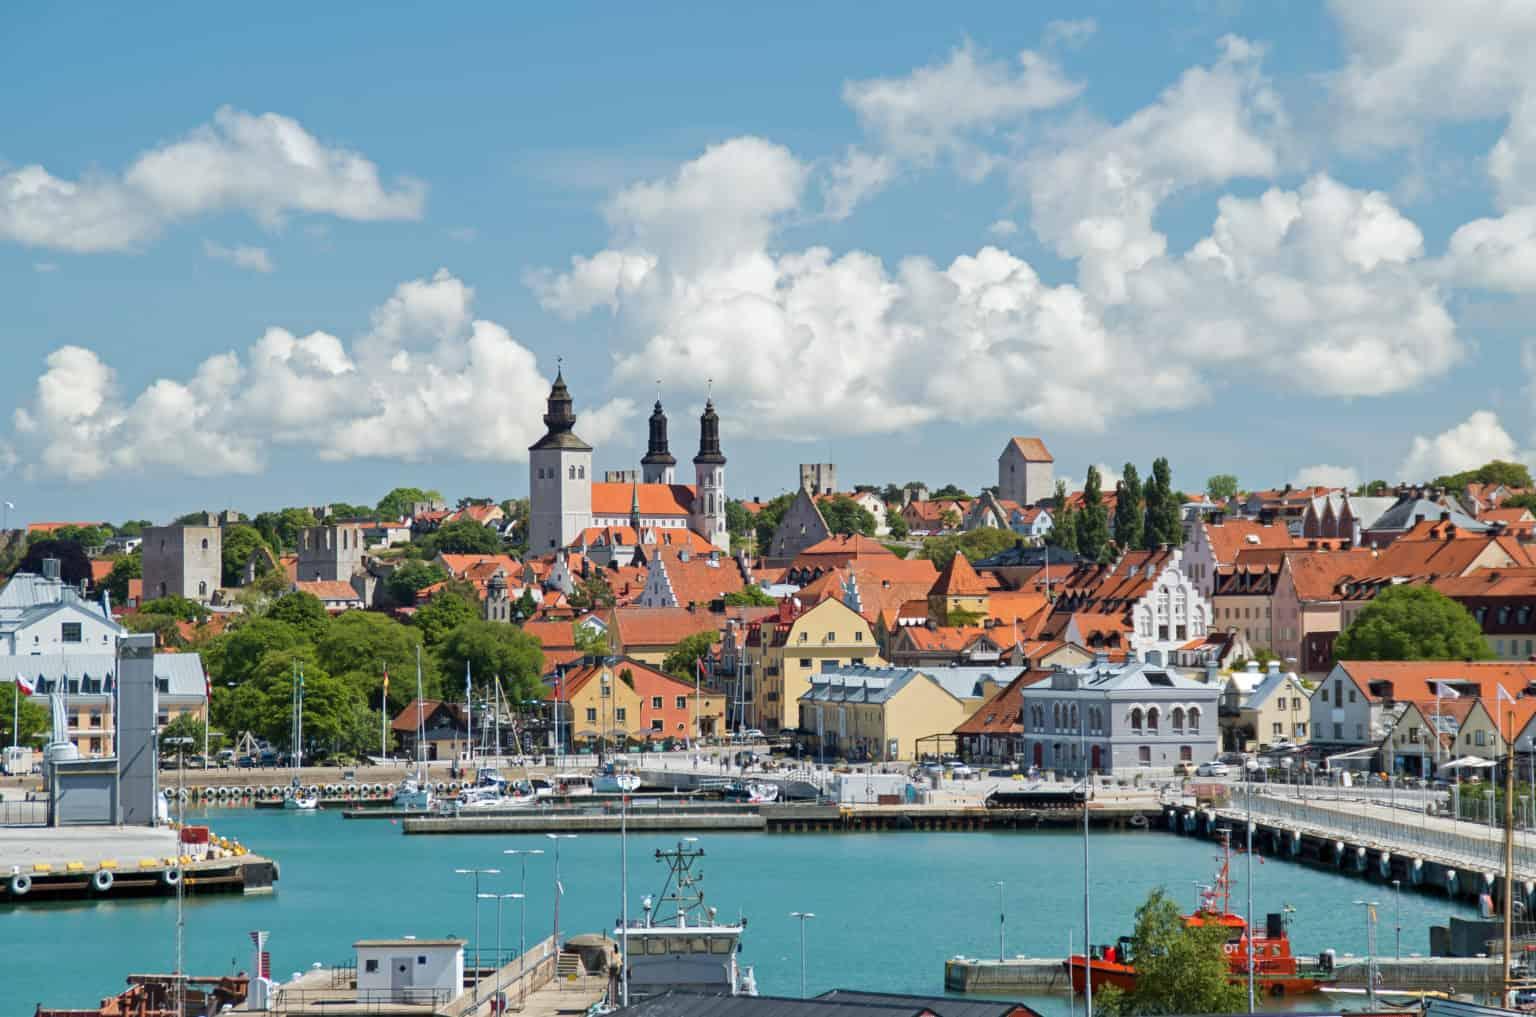 Walking tour in Visby